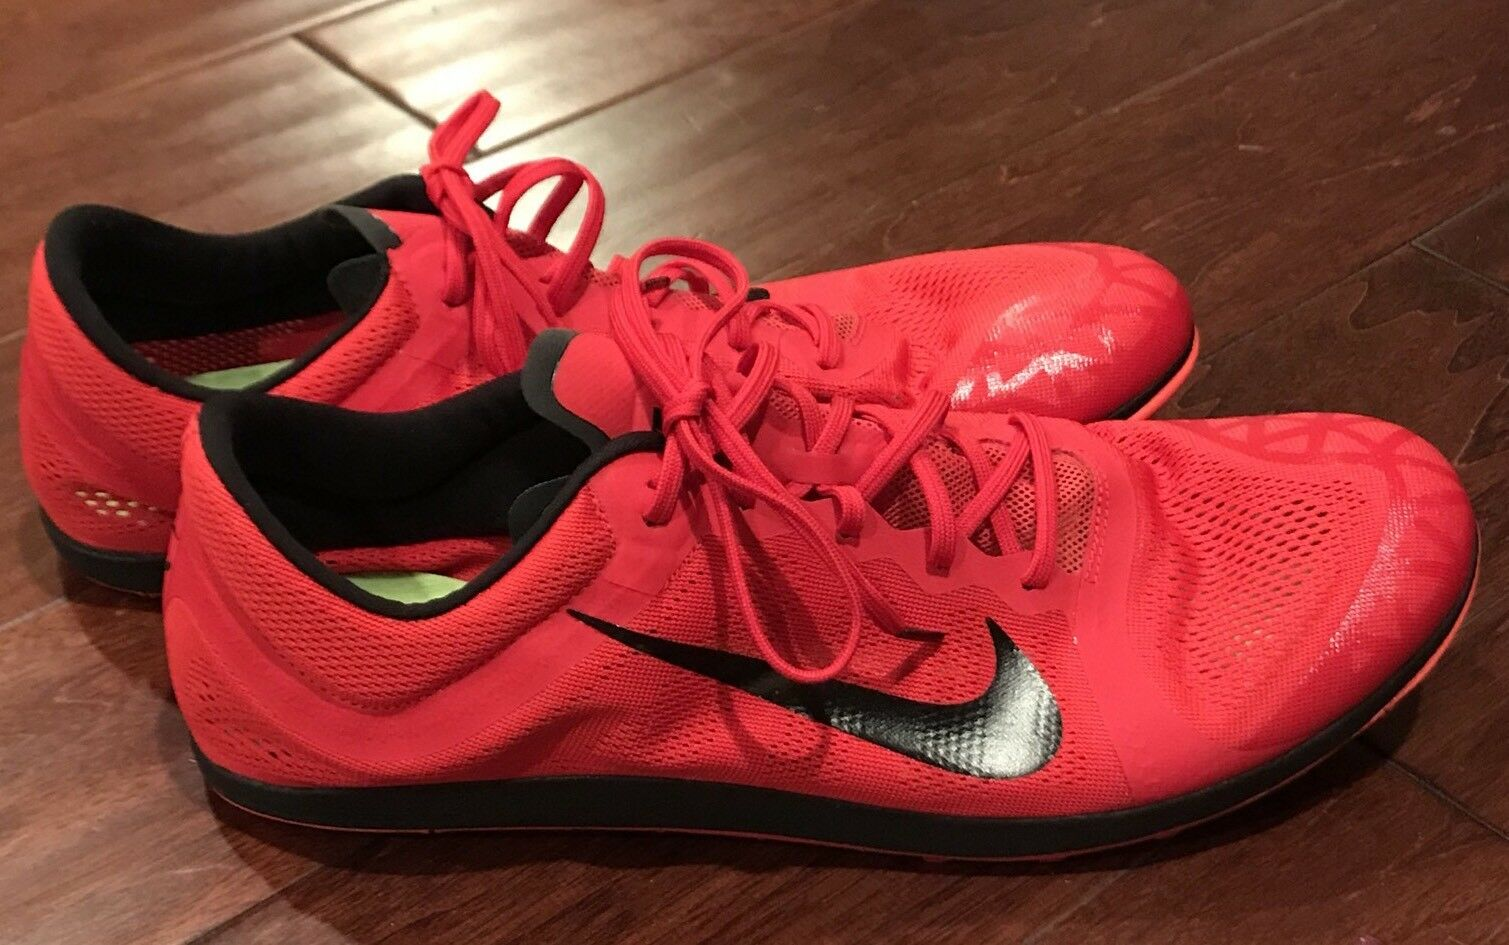 Hombre Nike Zoom XC Cross Country running Track Shoe SZ 14 Track running rojo negro baratos zapatos de mujer zapatos de mujer 7e5840